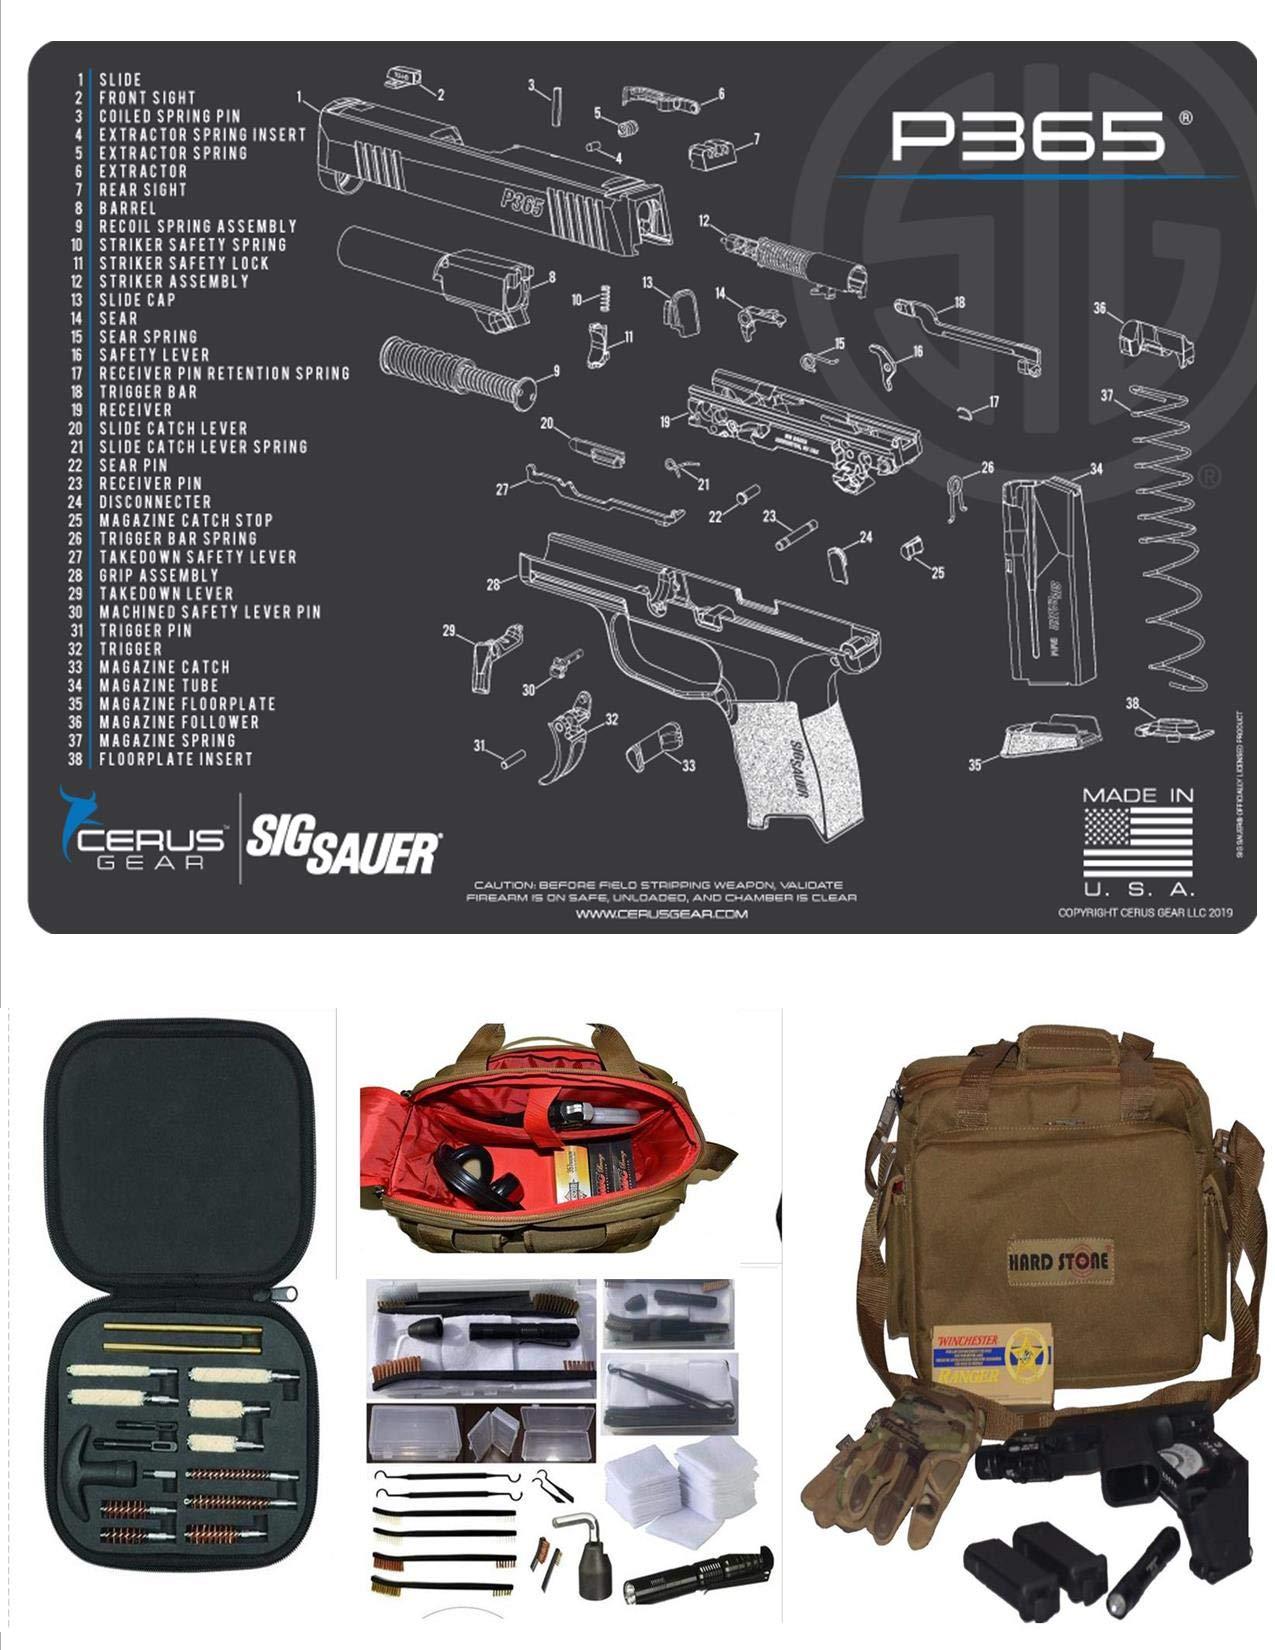 EDOG SIG P365 Cerus Schematic Gun Cleaning Mat & Coyote Hard Stone Hot Shot High Vis Handgun Pistol Range Duty Bag & 27 Pc Hand Gun Range/Field/Bench Cleaning Kit